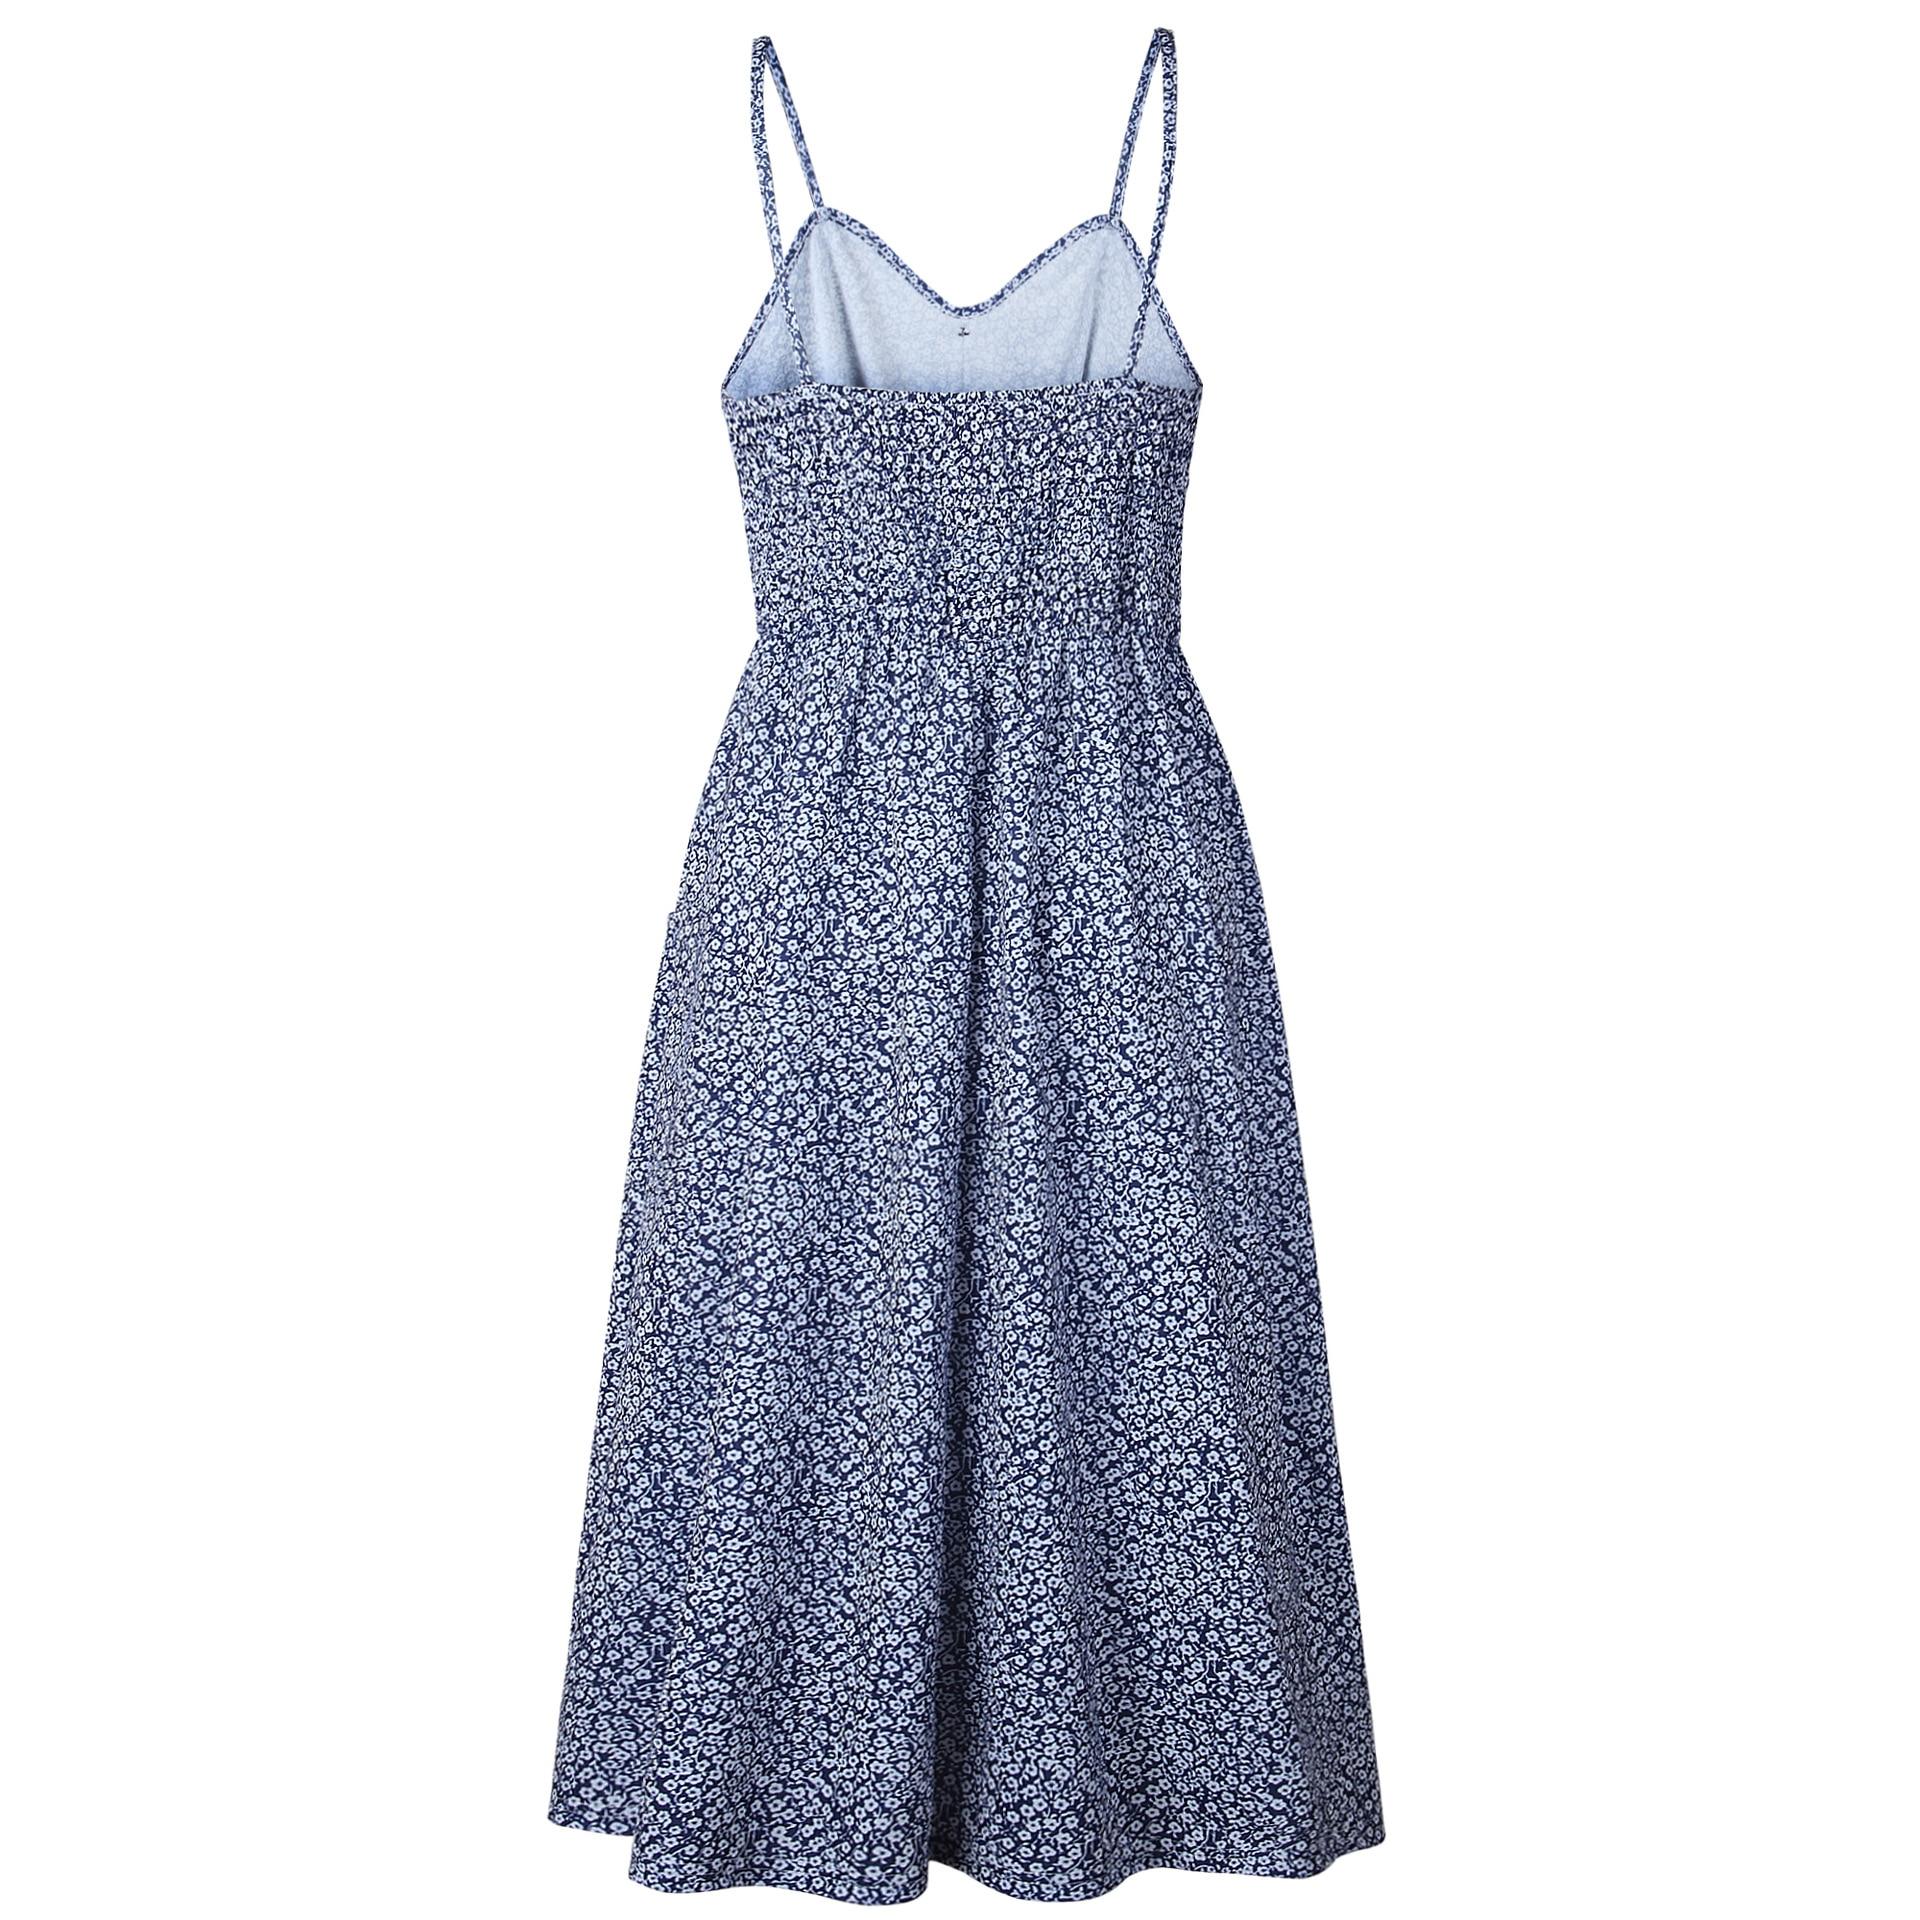 New Boho Off-shoulder Party Beach Sundress Spaghetti Long Dresses Plus Size Summer Women Button Decorated Print Dress CRRIFLZ 19